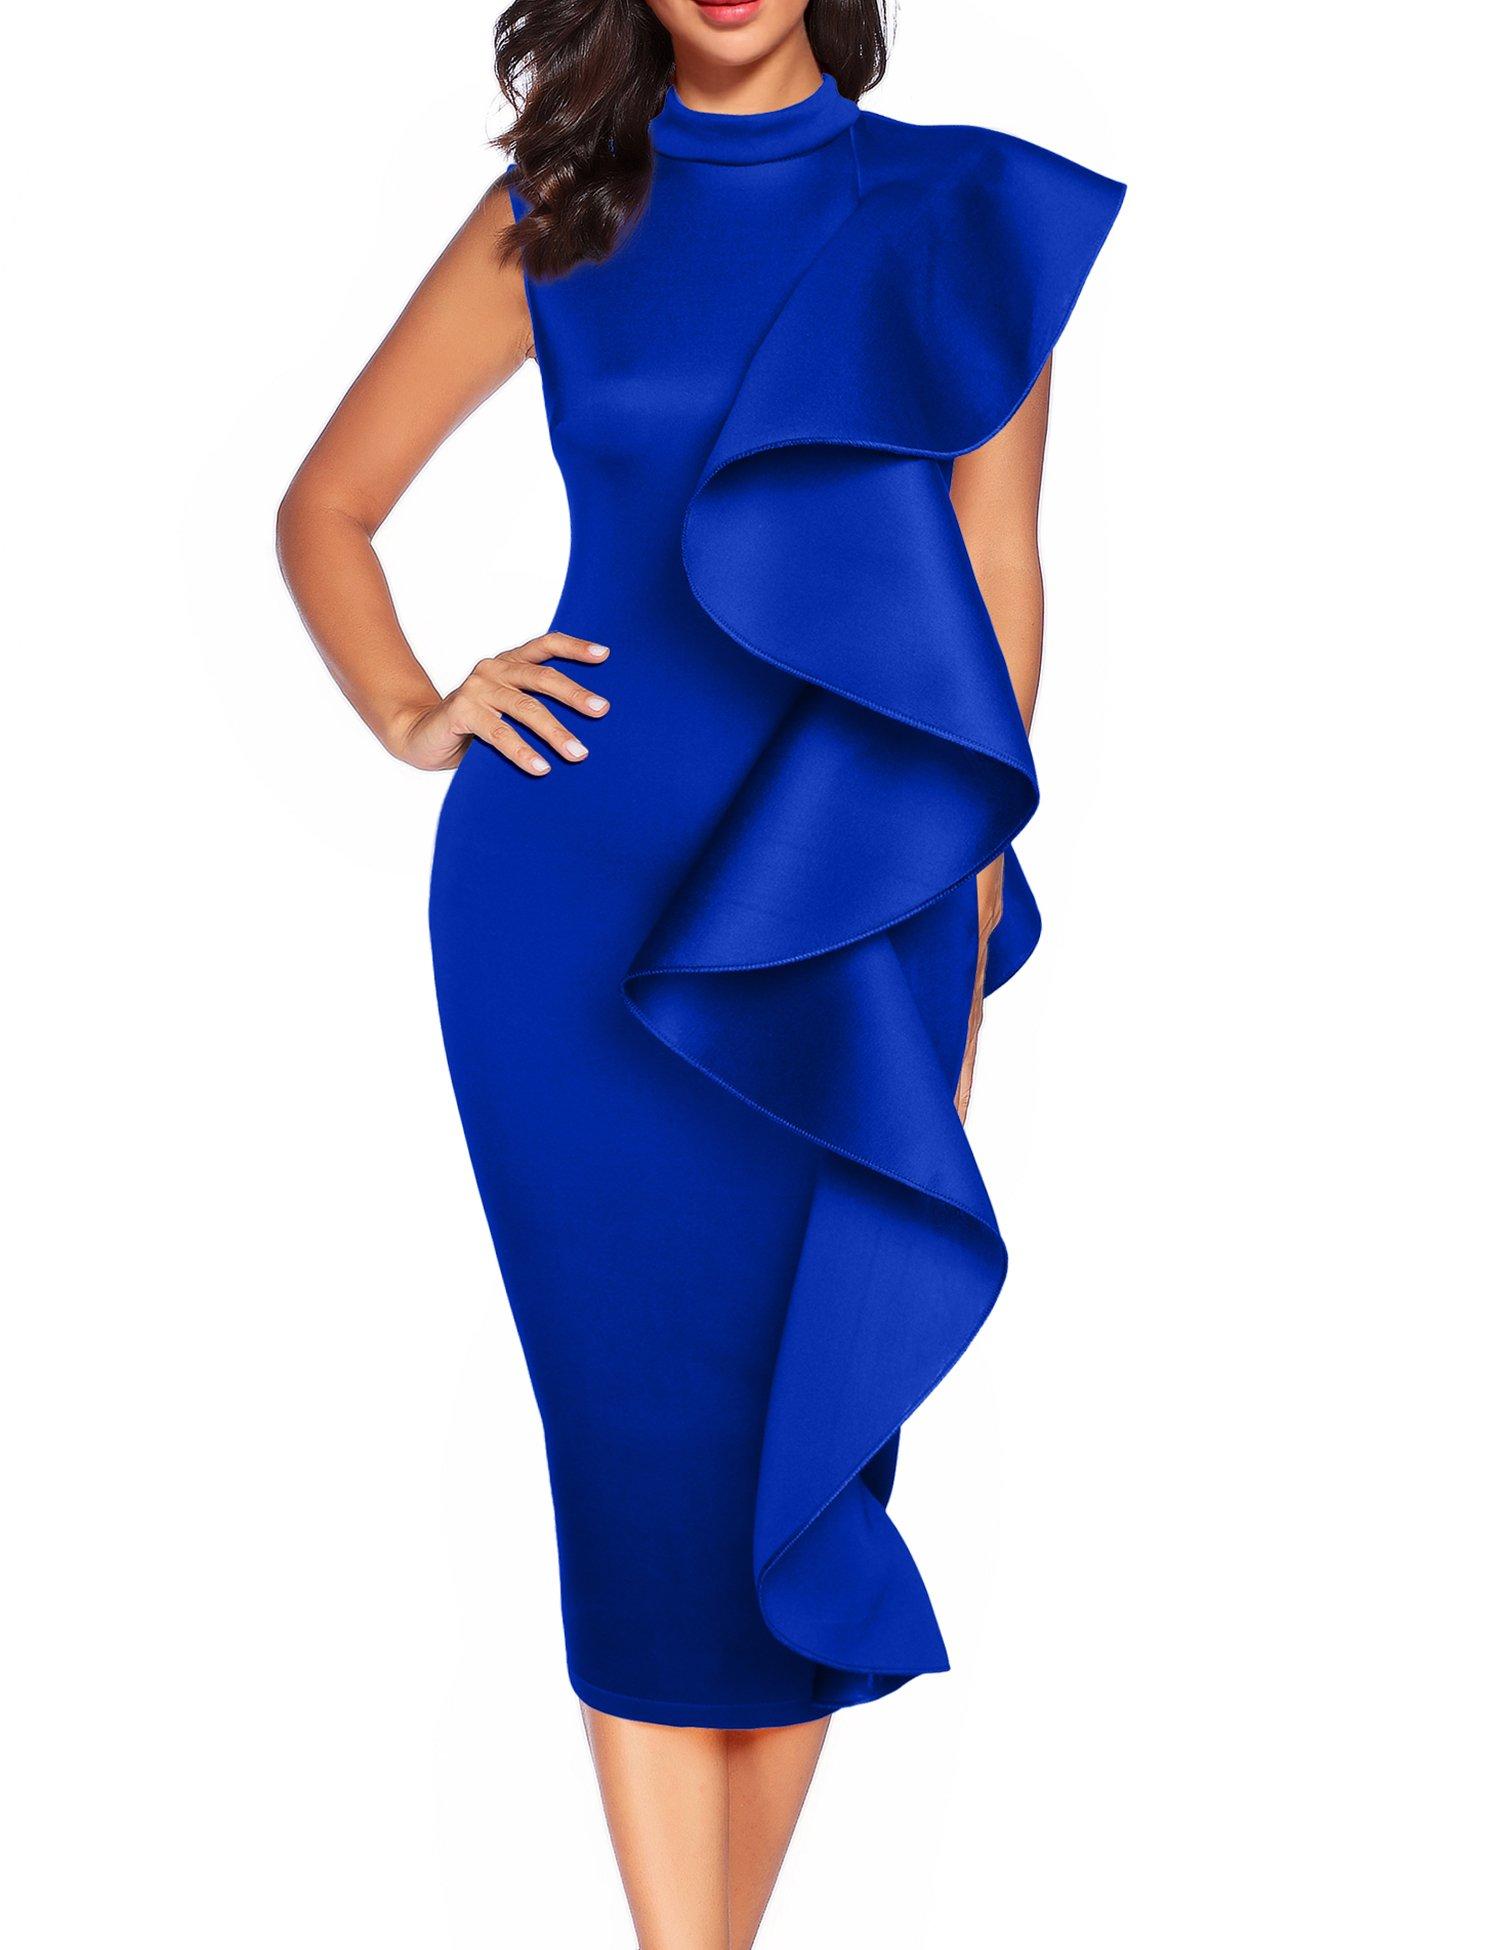 Women's Clubwear Dress Sleeveless Ruffles Bodycon Cocktail Party Dress (XL, Blue)